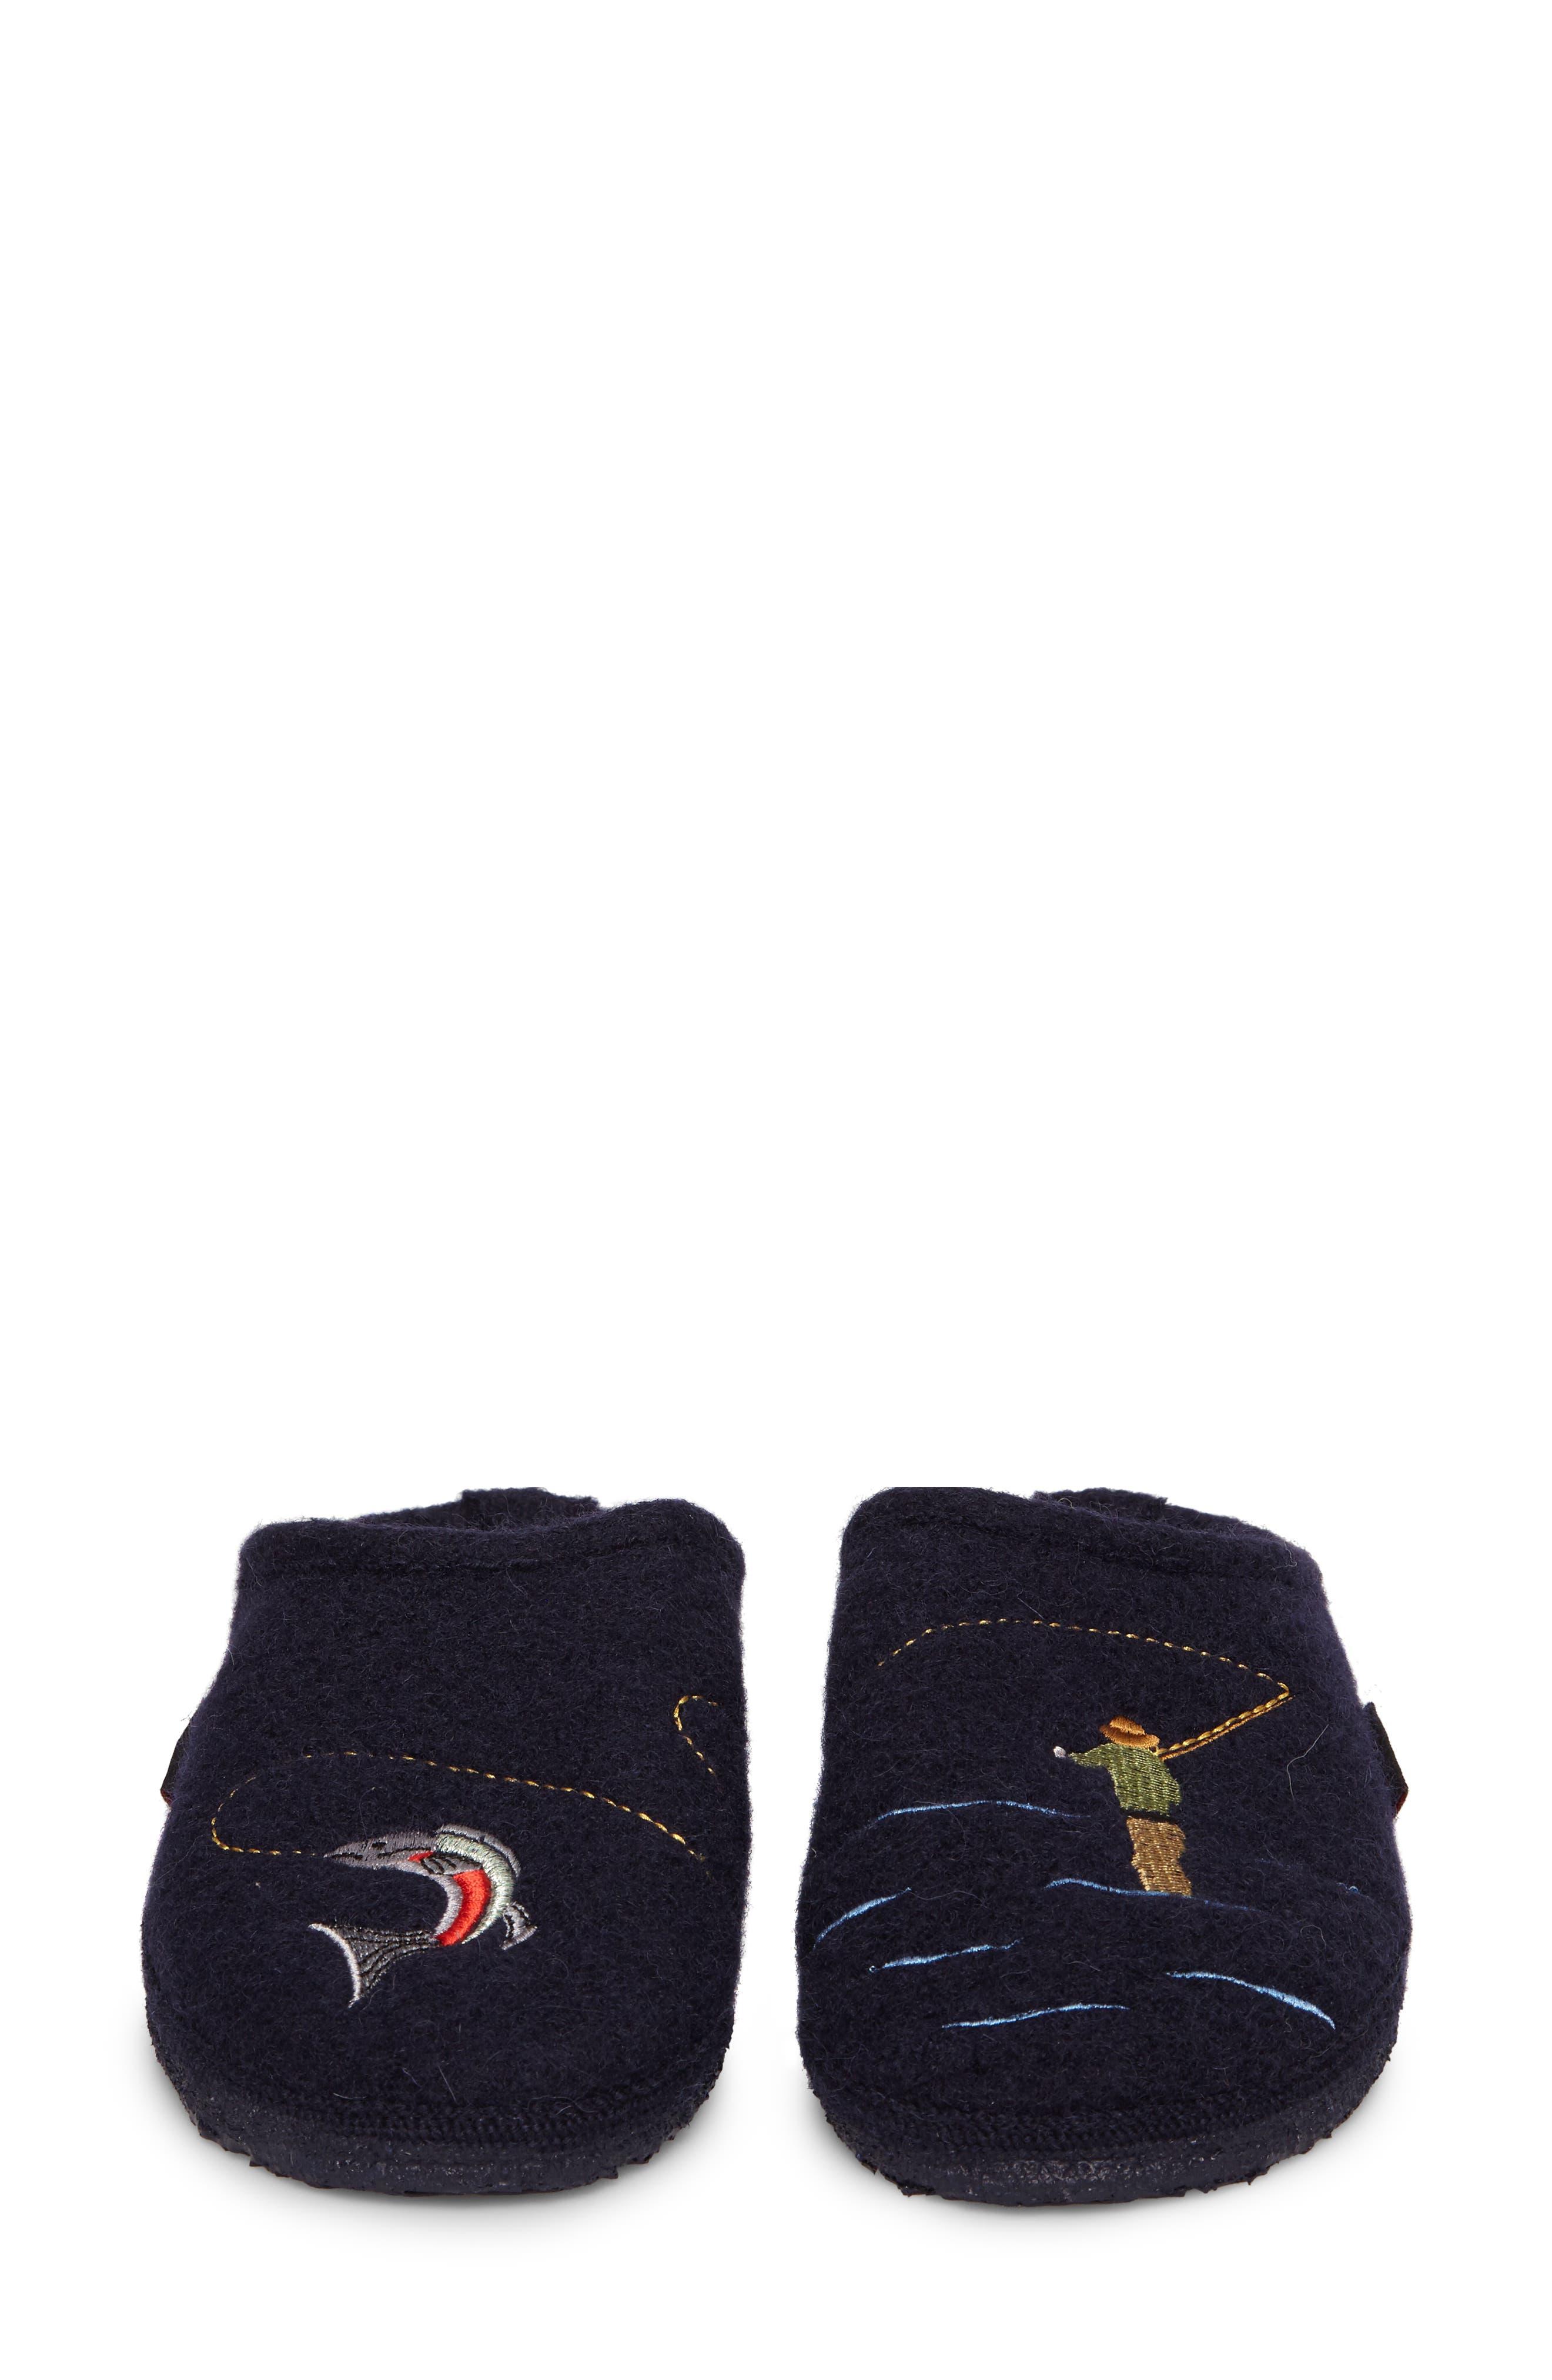 Riffle Wool Slipper,                             Alternate thumbnail 4, color,                             Ocean Wool